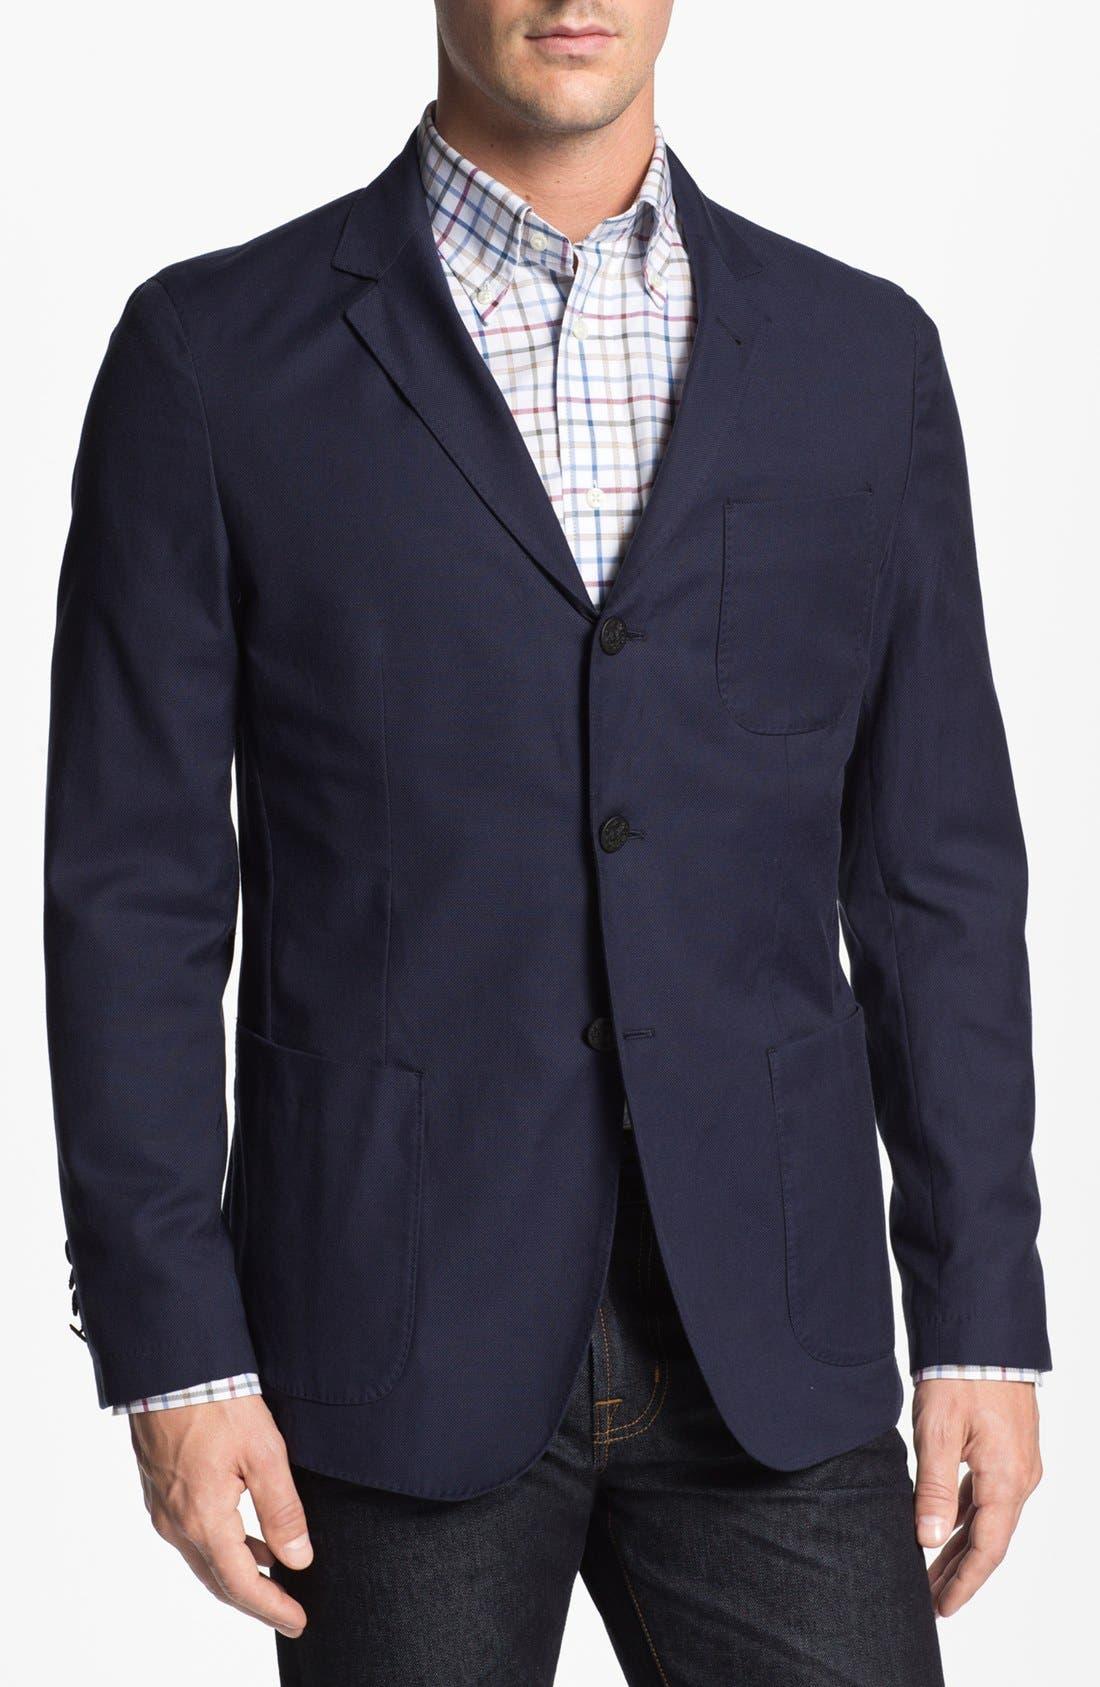 Alternate Image 1 Selected - Façonnable 'Veste' Piqué Sportcoat